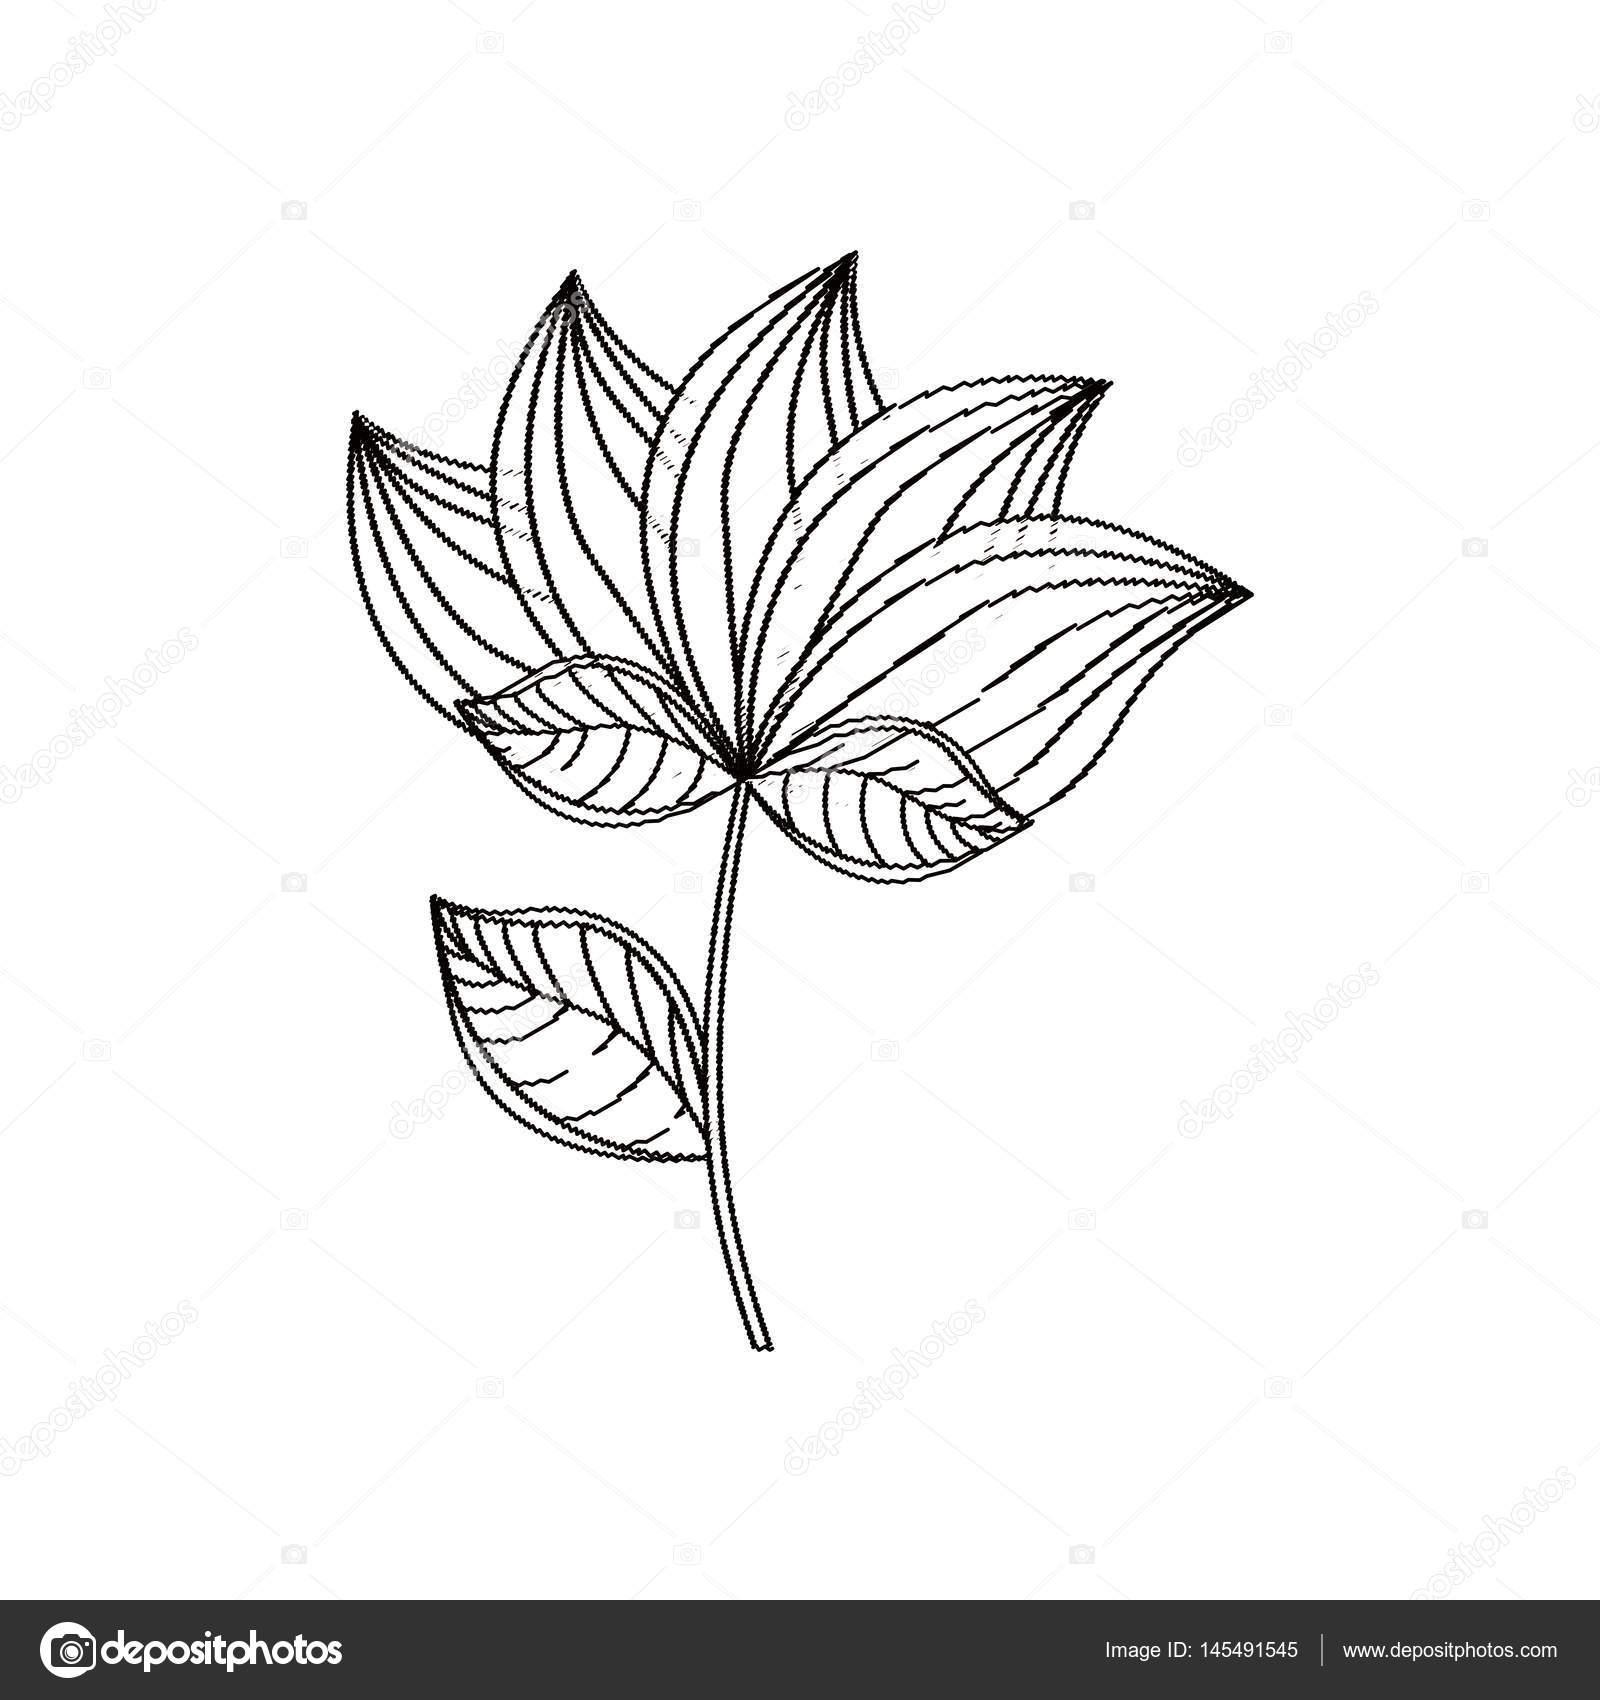 Lotus flower decoration sketch stock vector djv 145491545 lotus flower decoration sketch stock vector izmirmasajfo